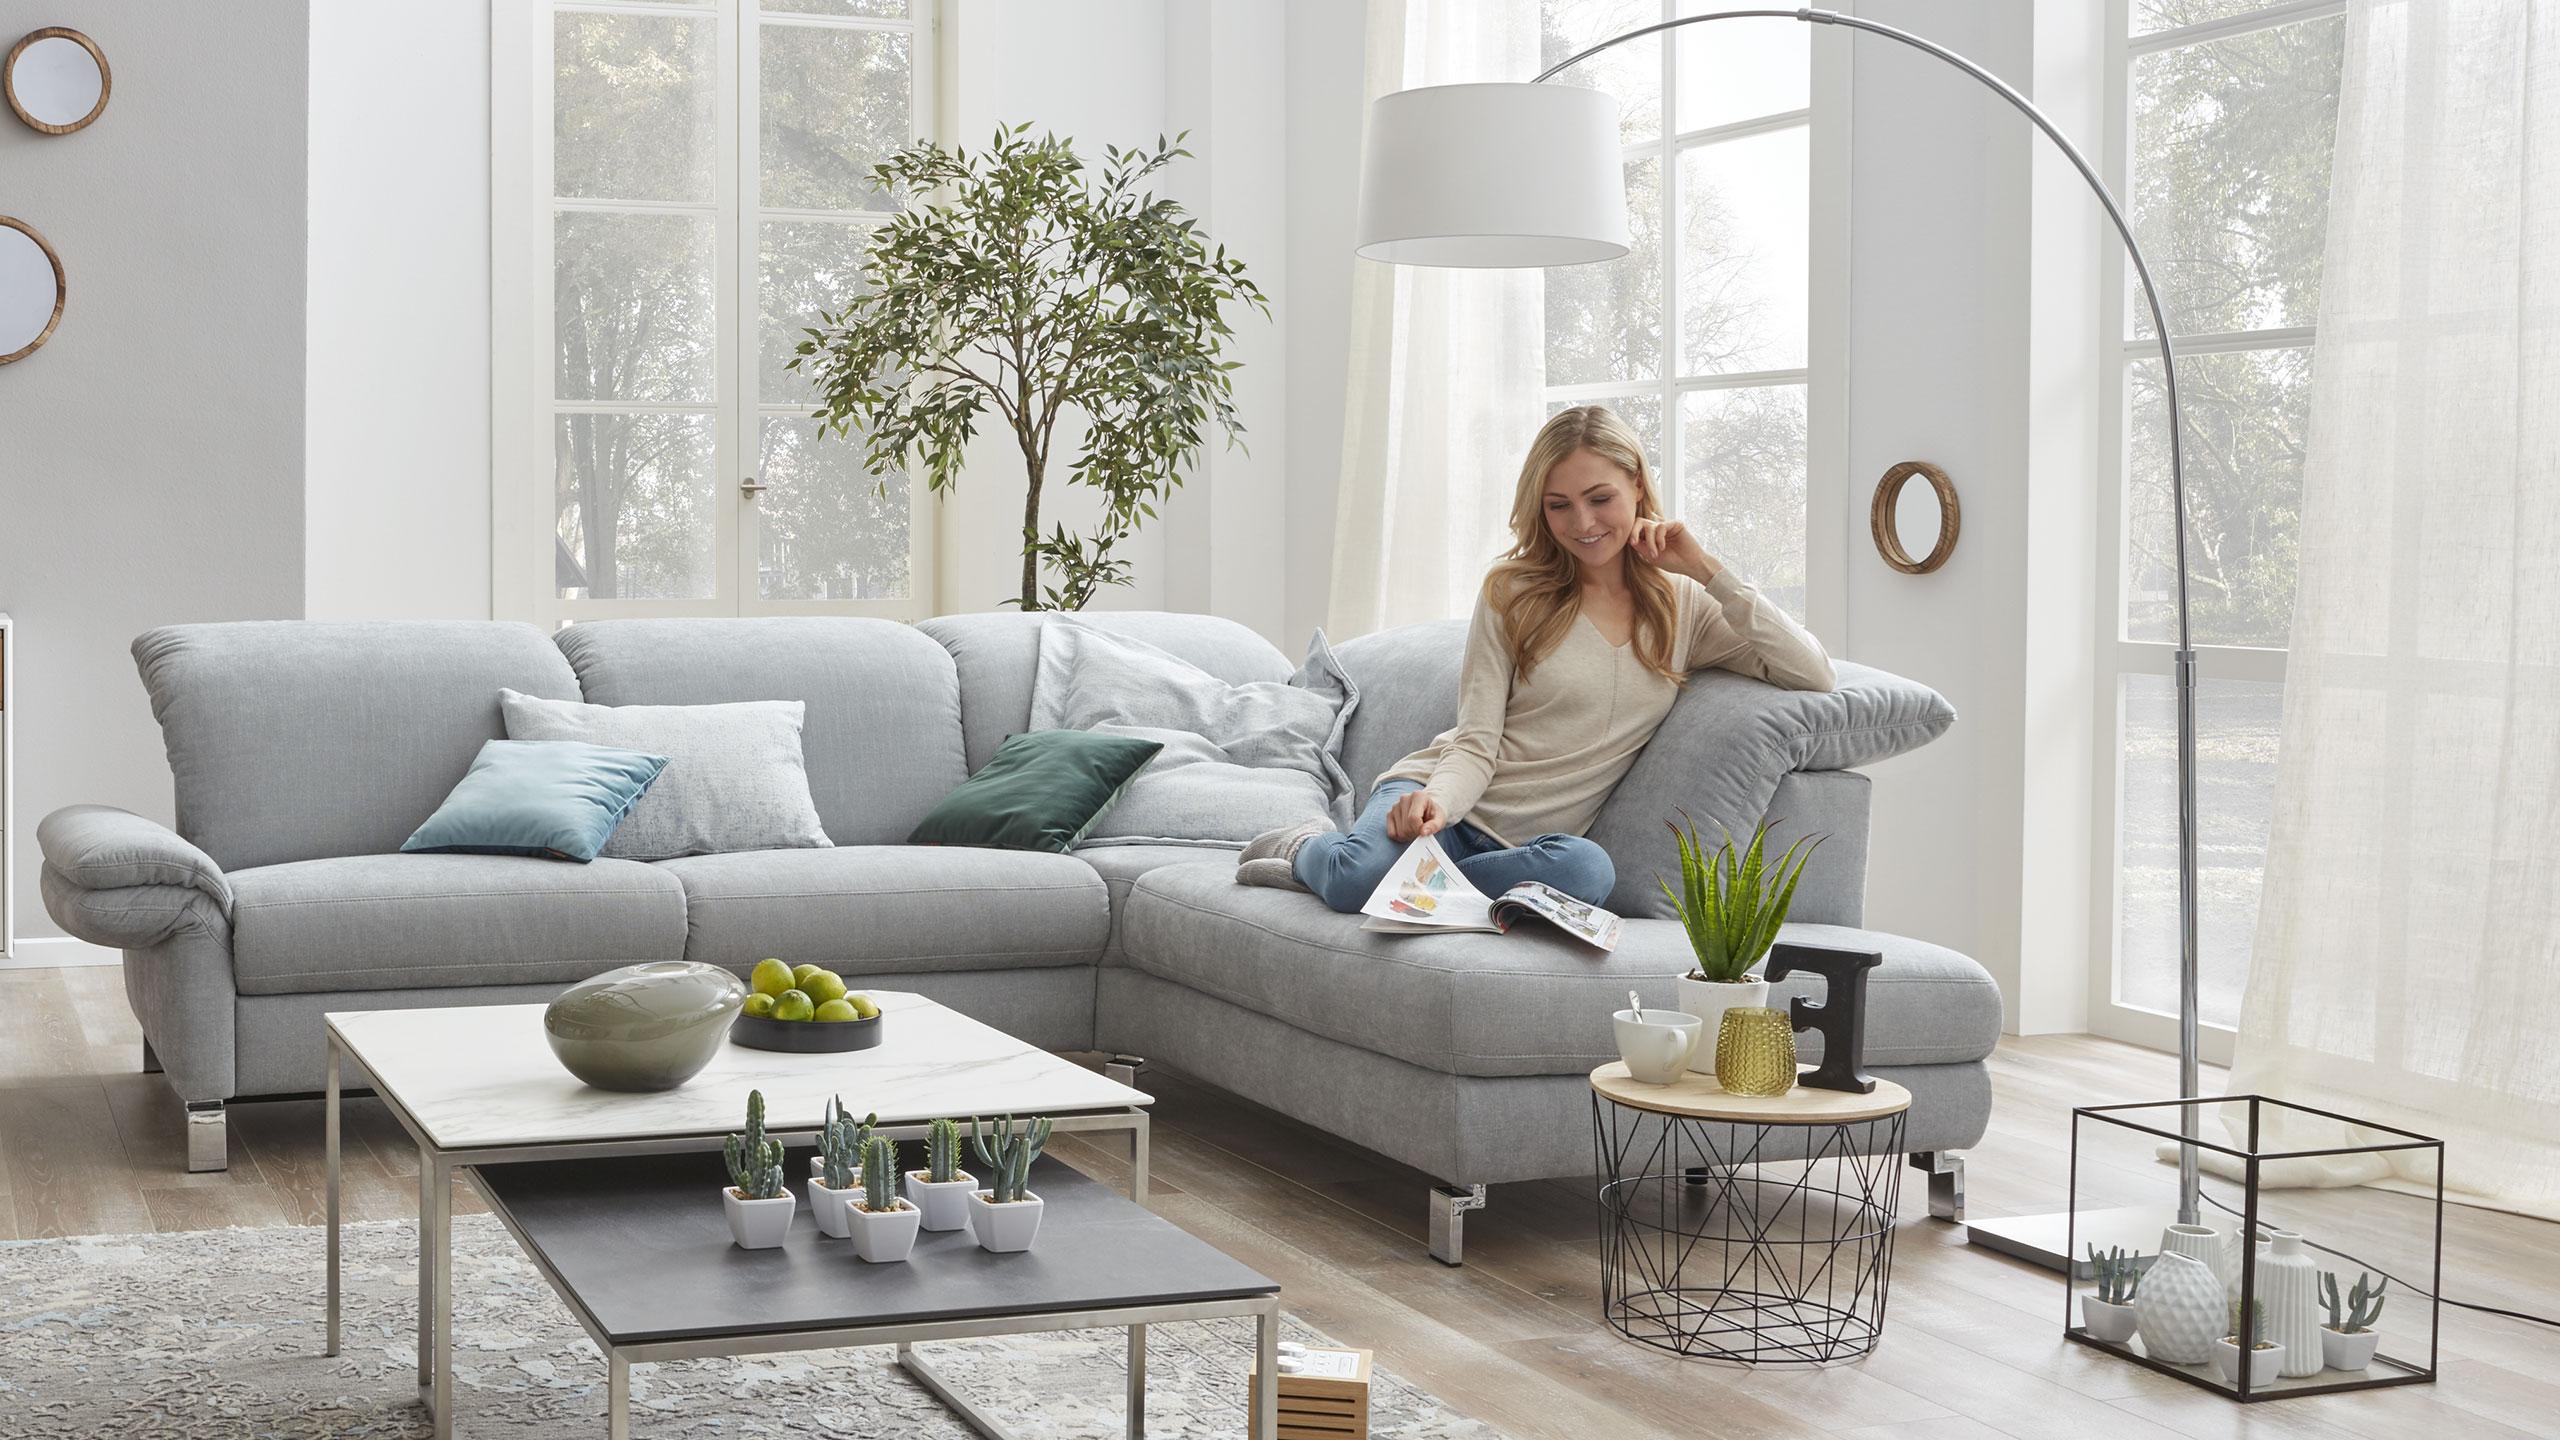 Awesome Farbe Puderrosa Kombinieren Wohnen Images - Interior Design ...